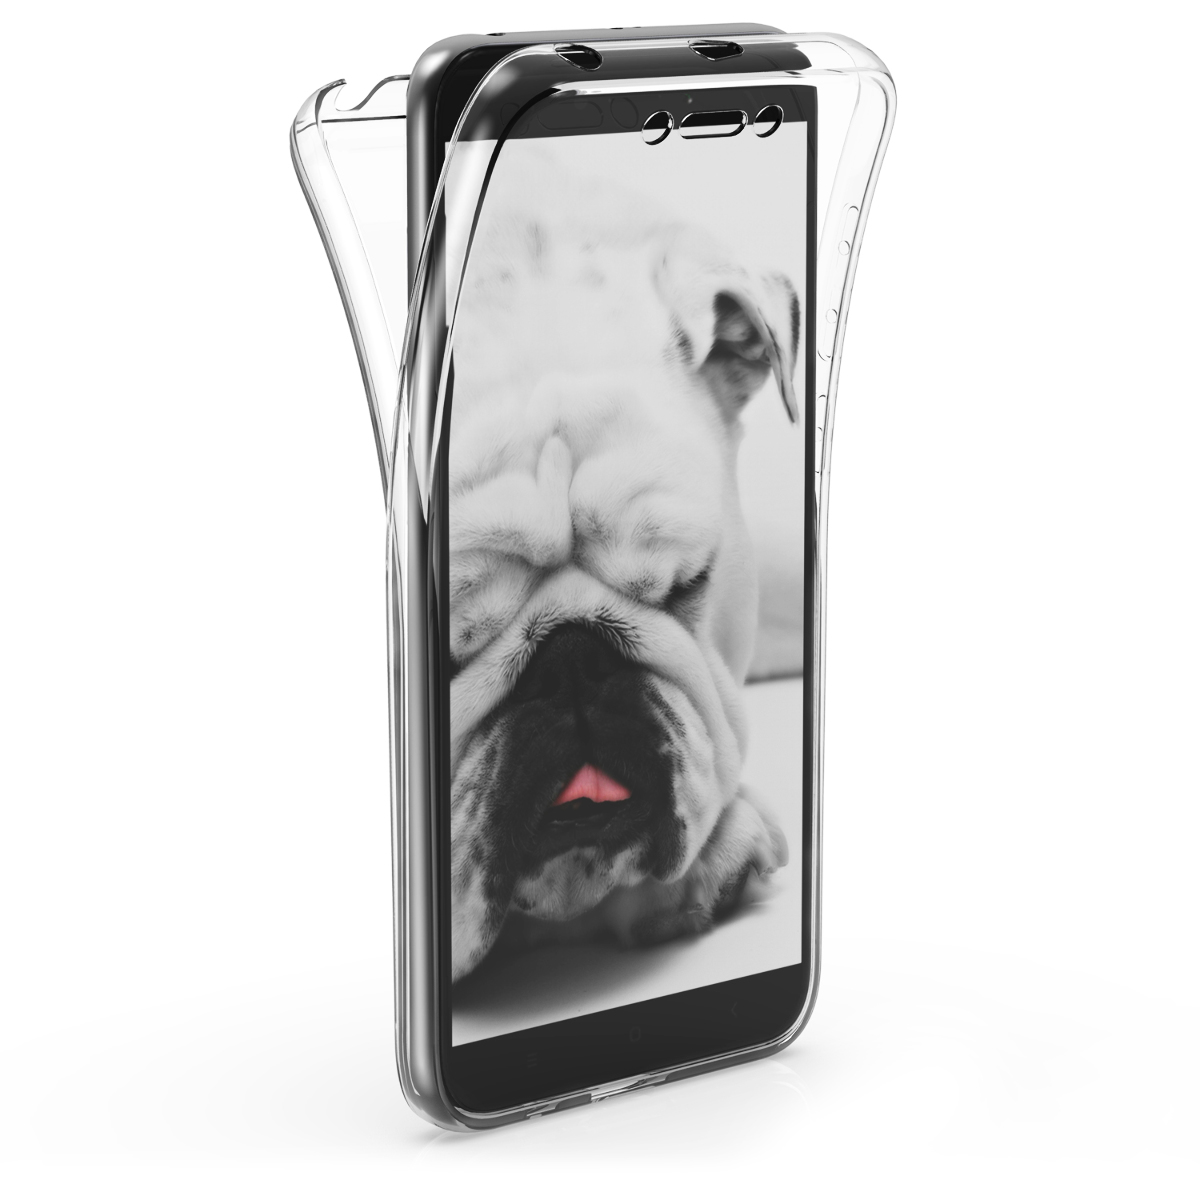 KW Διάφανη Θήκη Σιλικόνης Full Body Xiaomi Redmi 5A (46143.03)